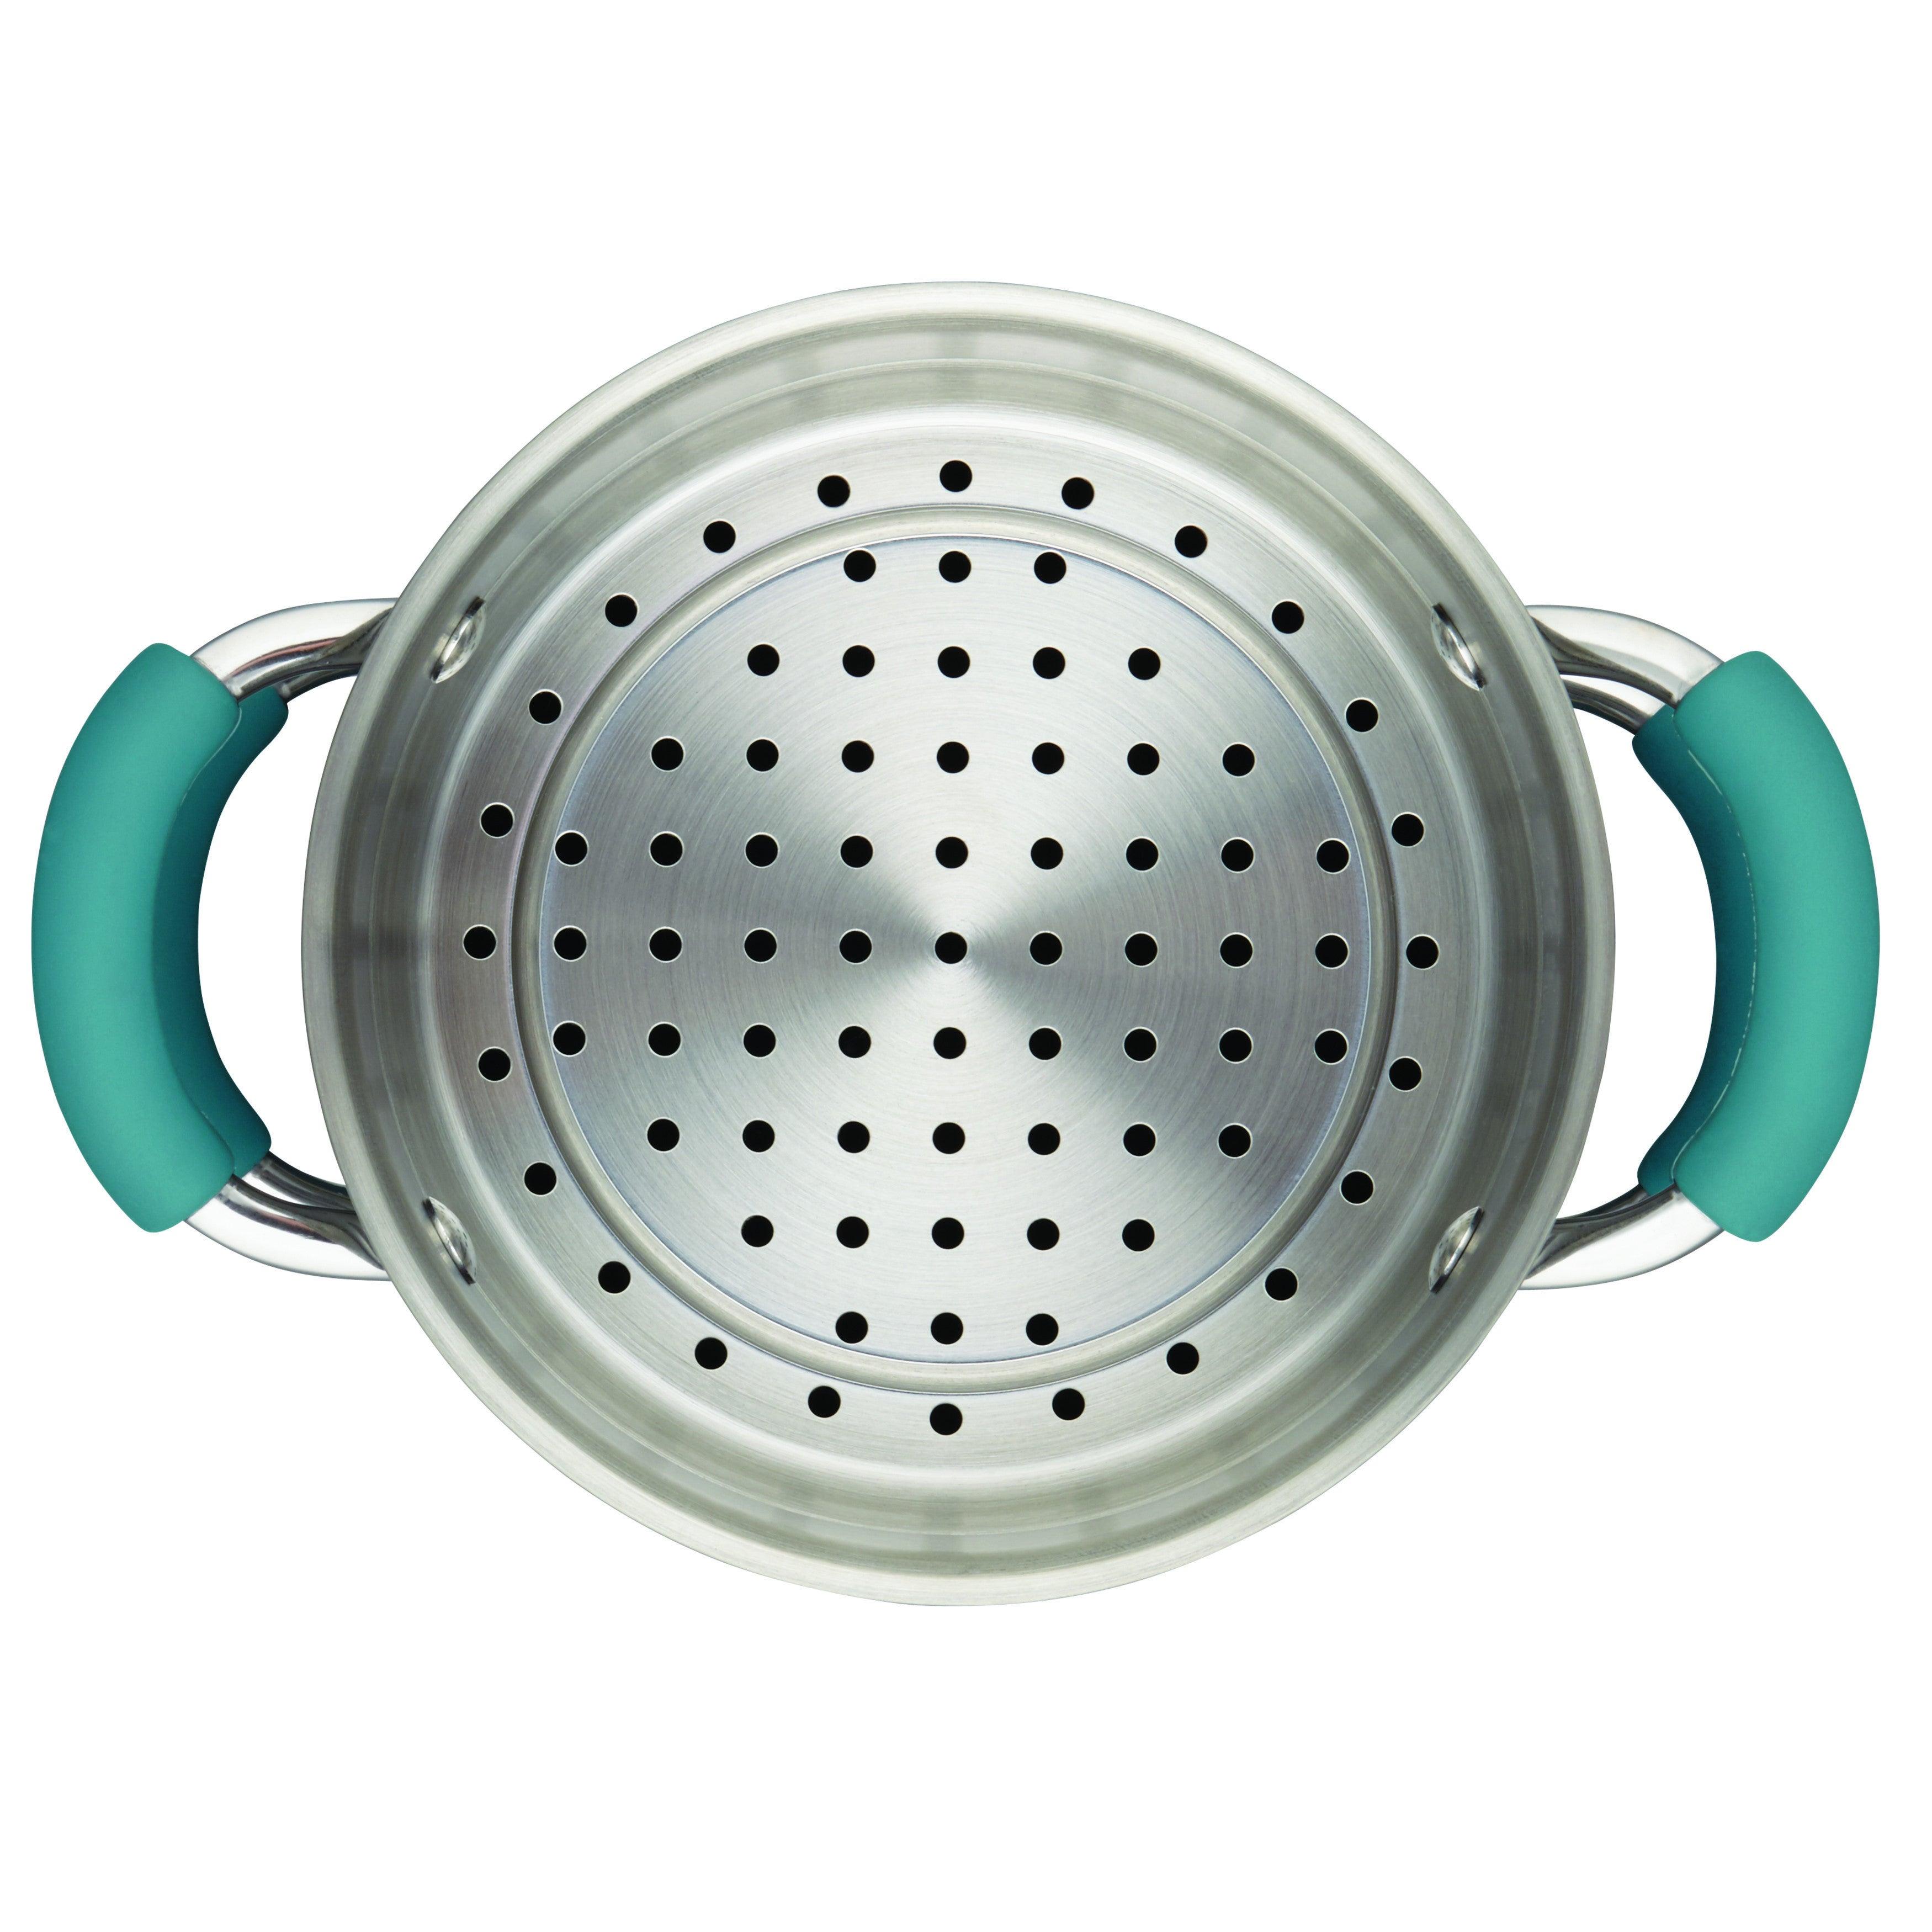 Rachael Ray Cucina Hard Enamel Nonstick 3-quart Covered Multi-pot ...